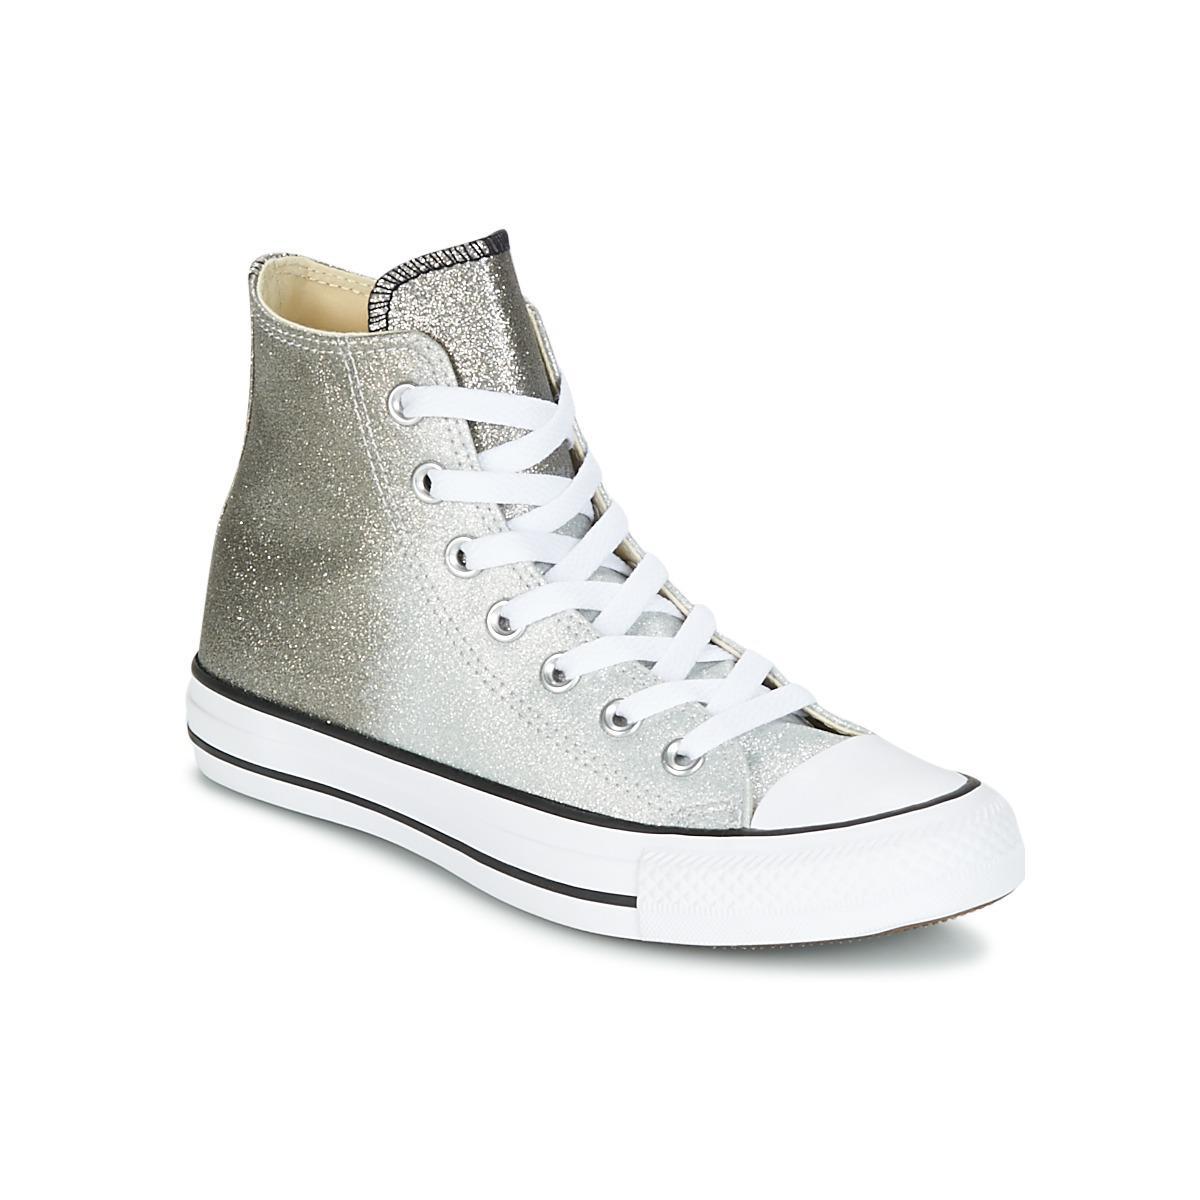 205282fb2dfc Converse Chuck Taylor All Star Hi Ombre Metallic Women s Shoes (high ...